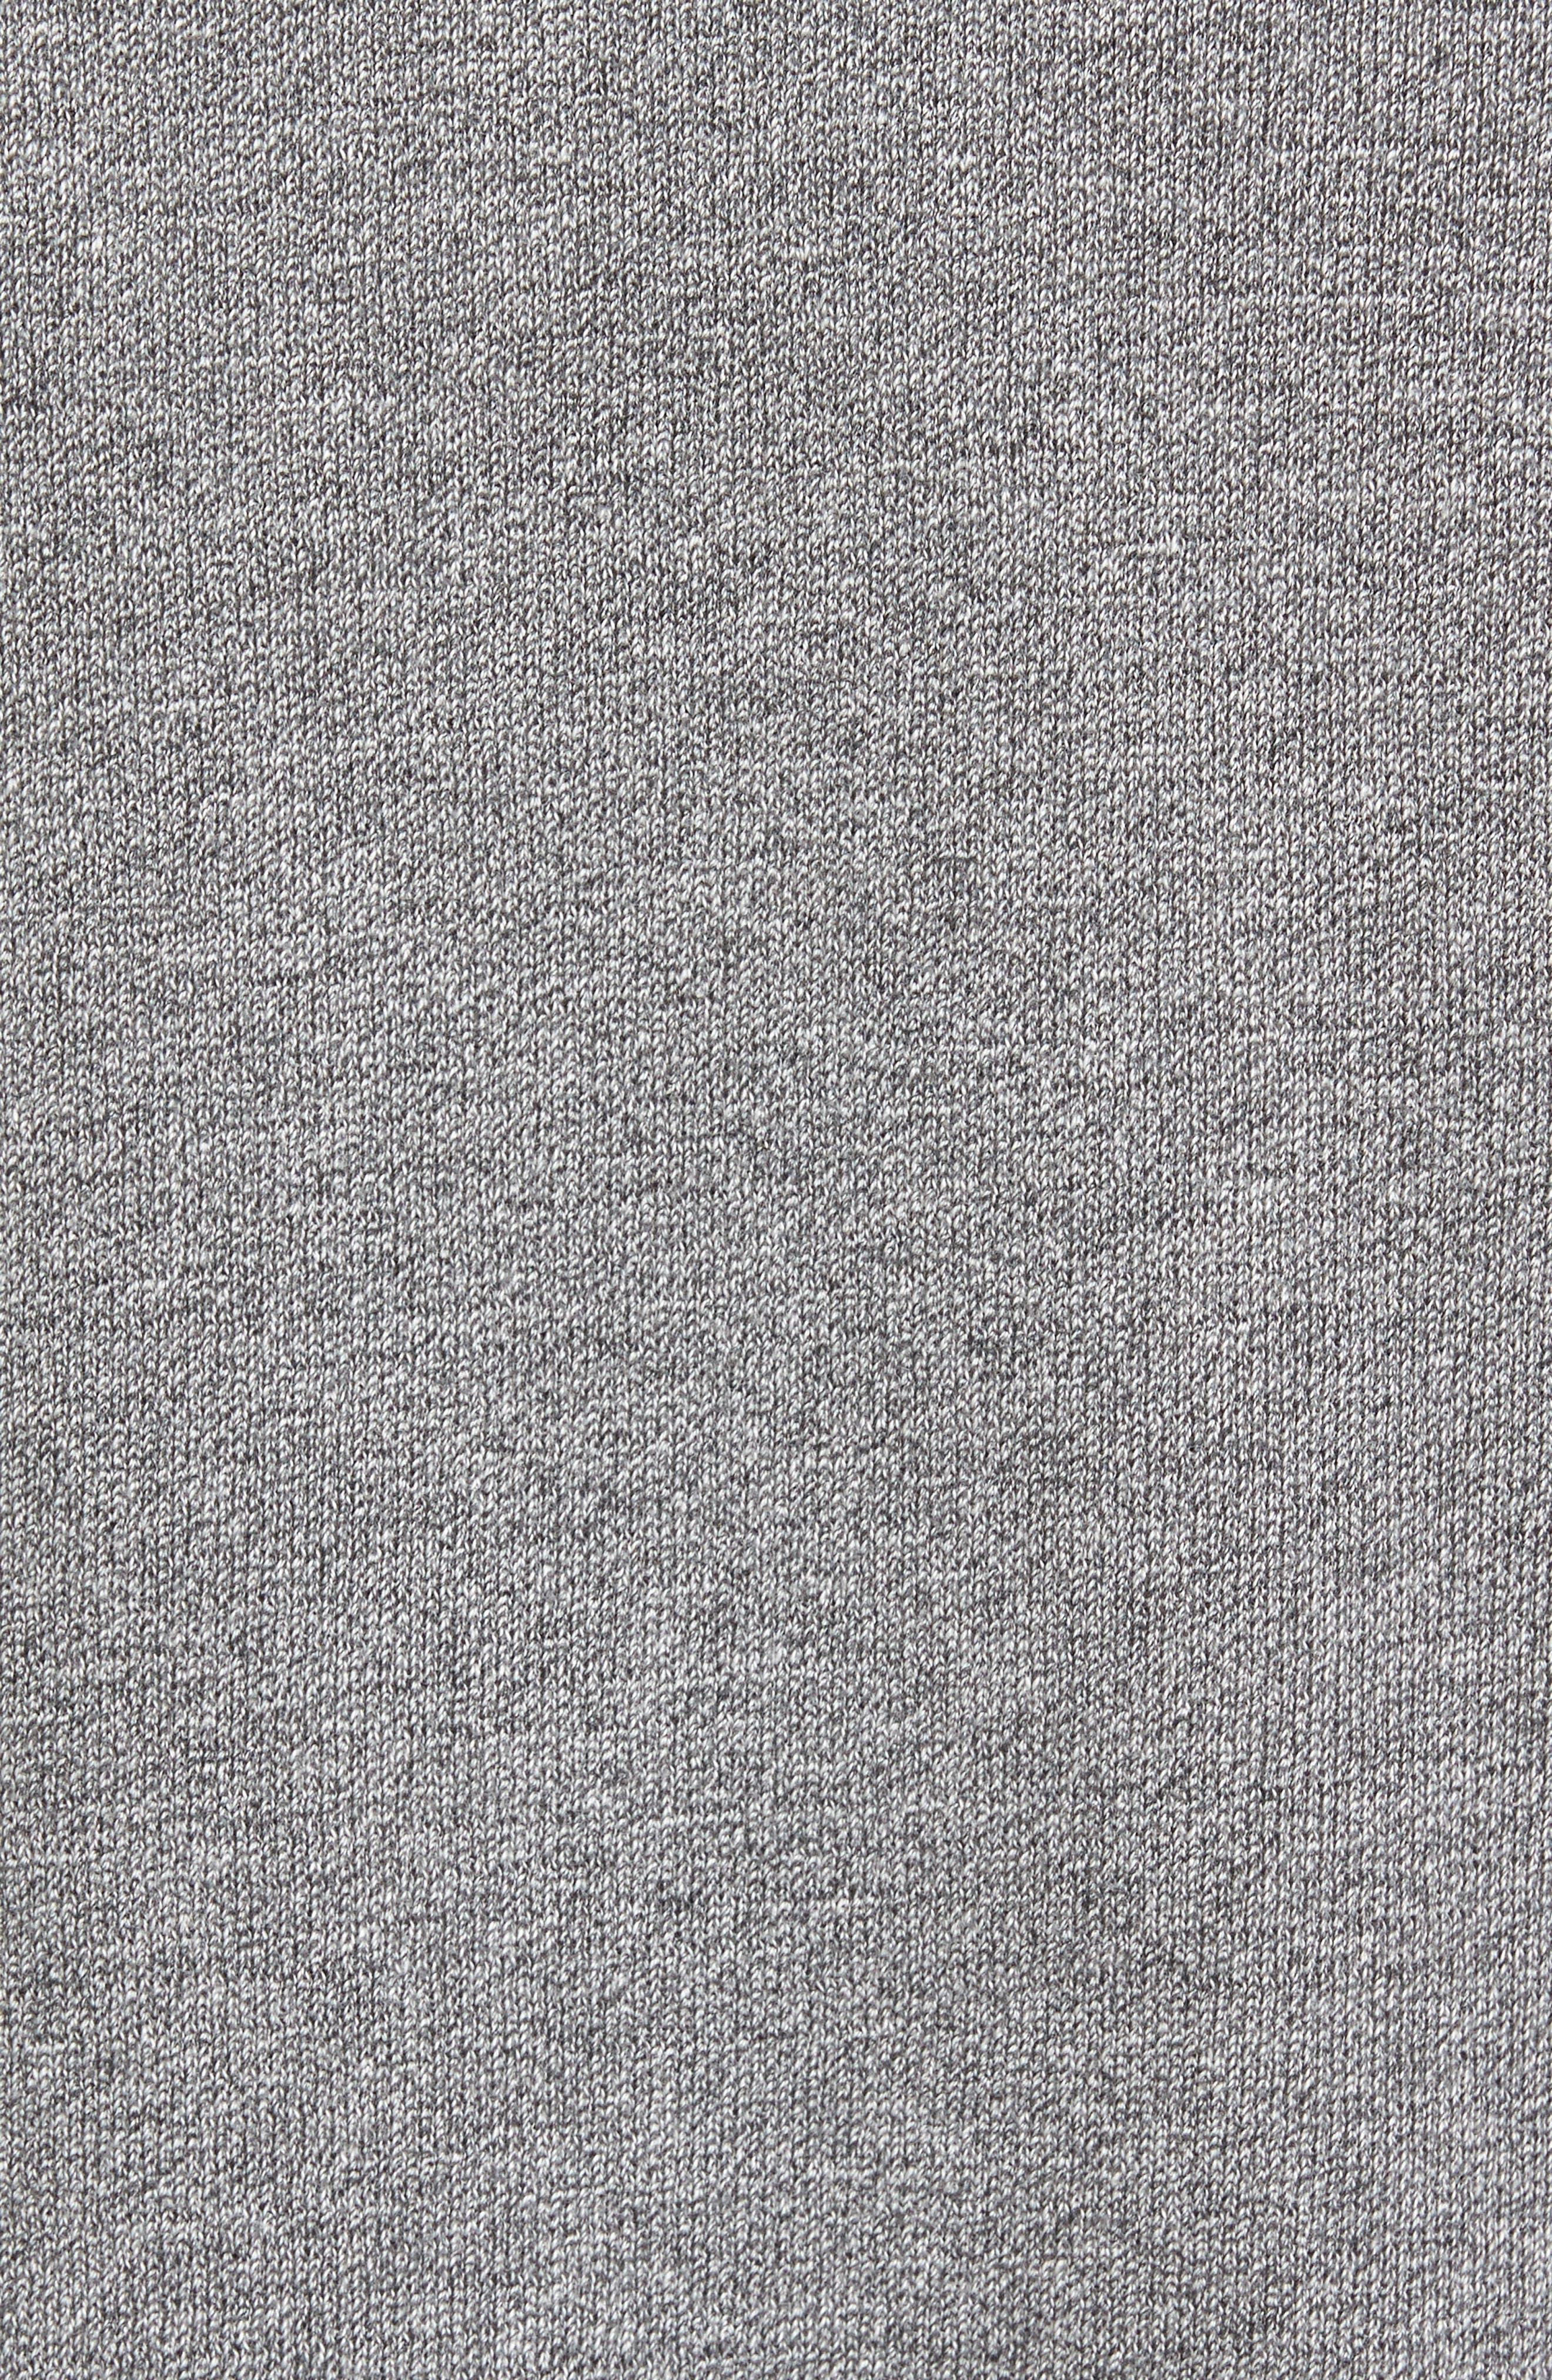 NFL Stitch of Liberty Embroidered Crewneck Sweatshirt,                             Alternate thumbnail 152, color,